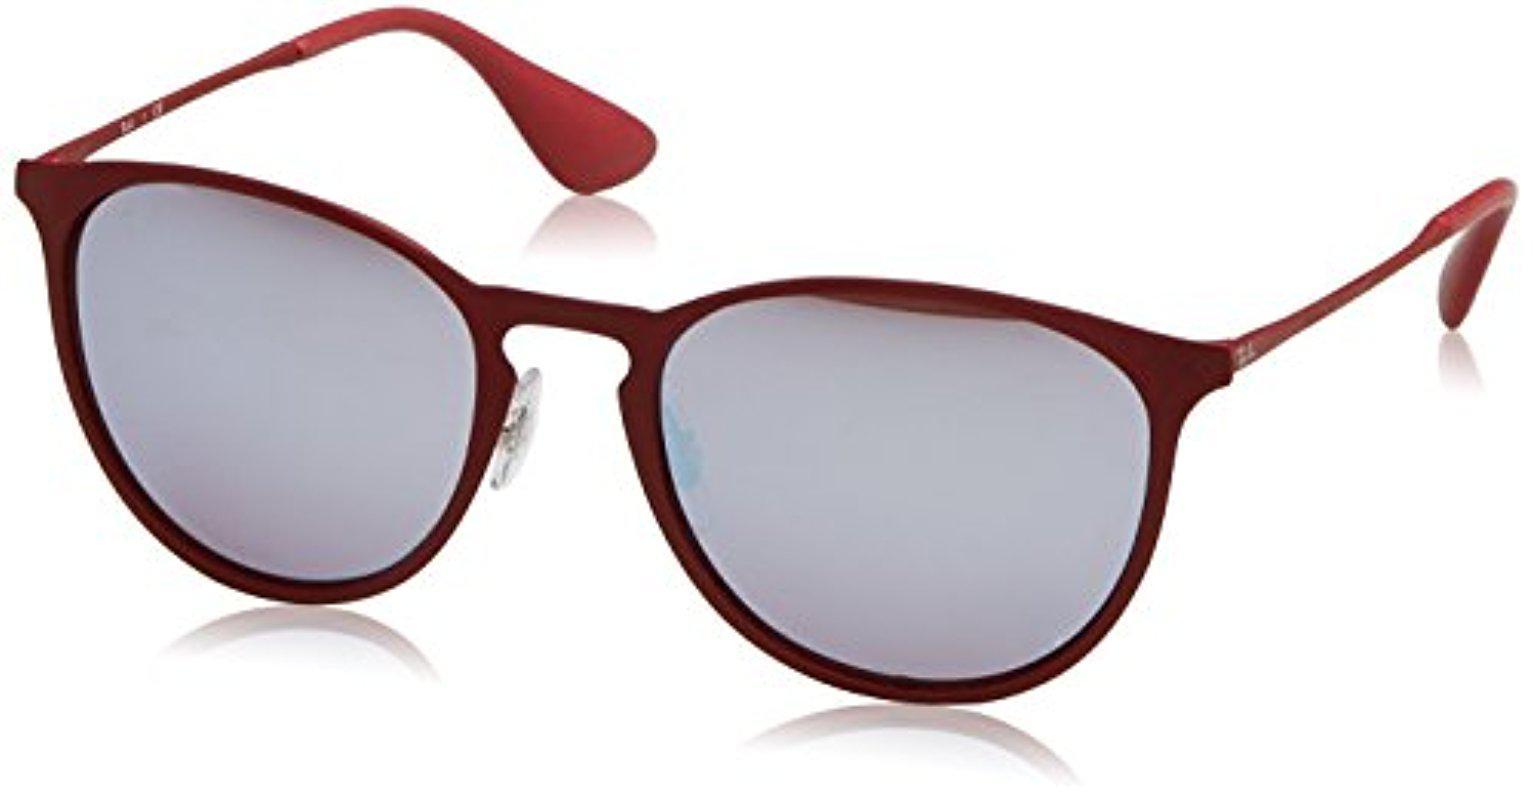 b15d151adb Lyst - Ray-Ban Erika Metal Rb3539 Non-polarized Sunglasses